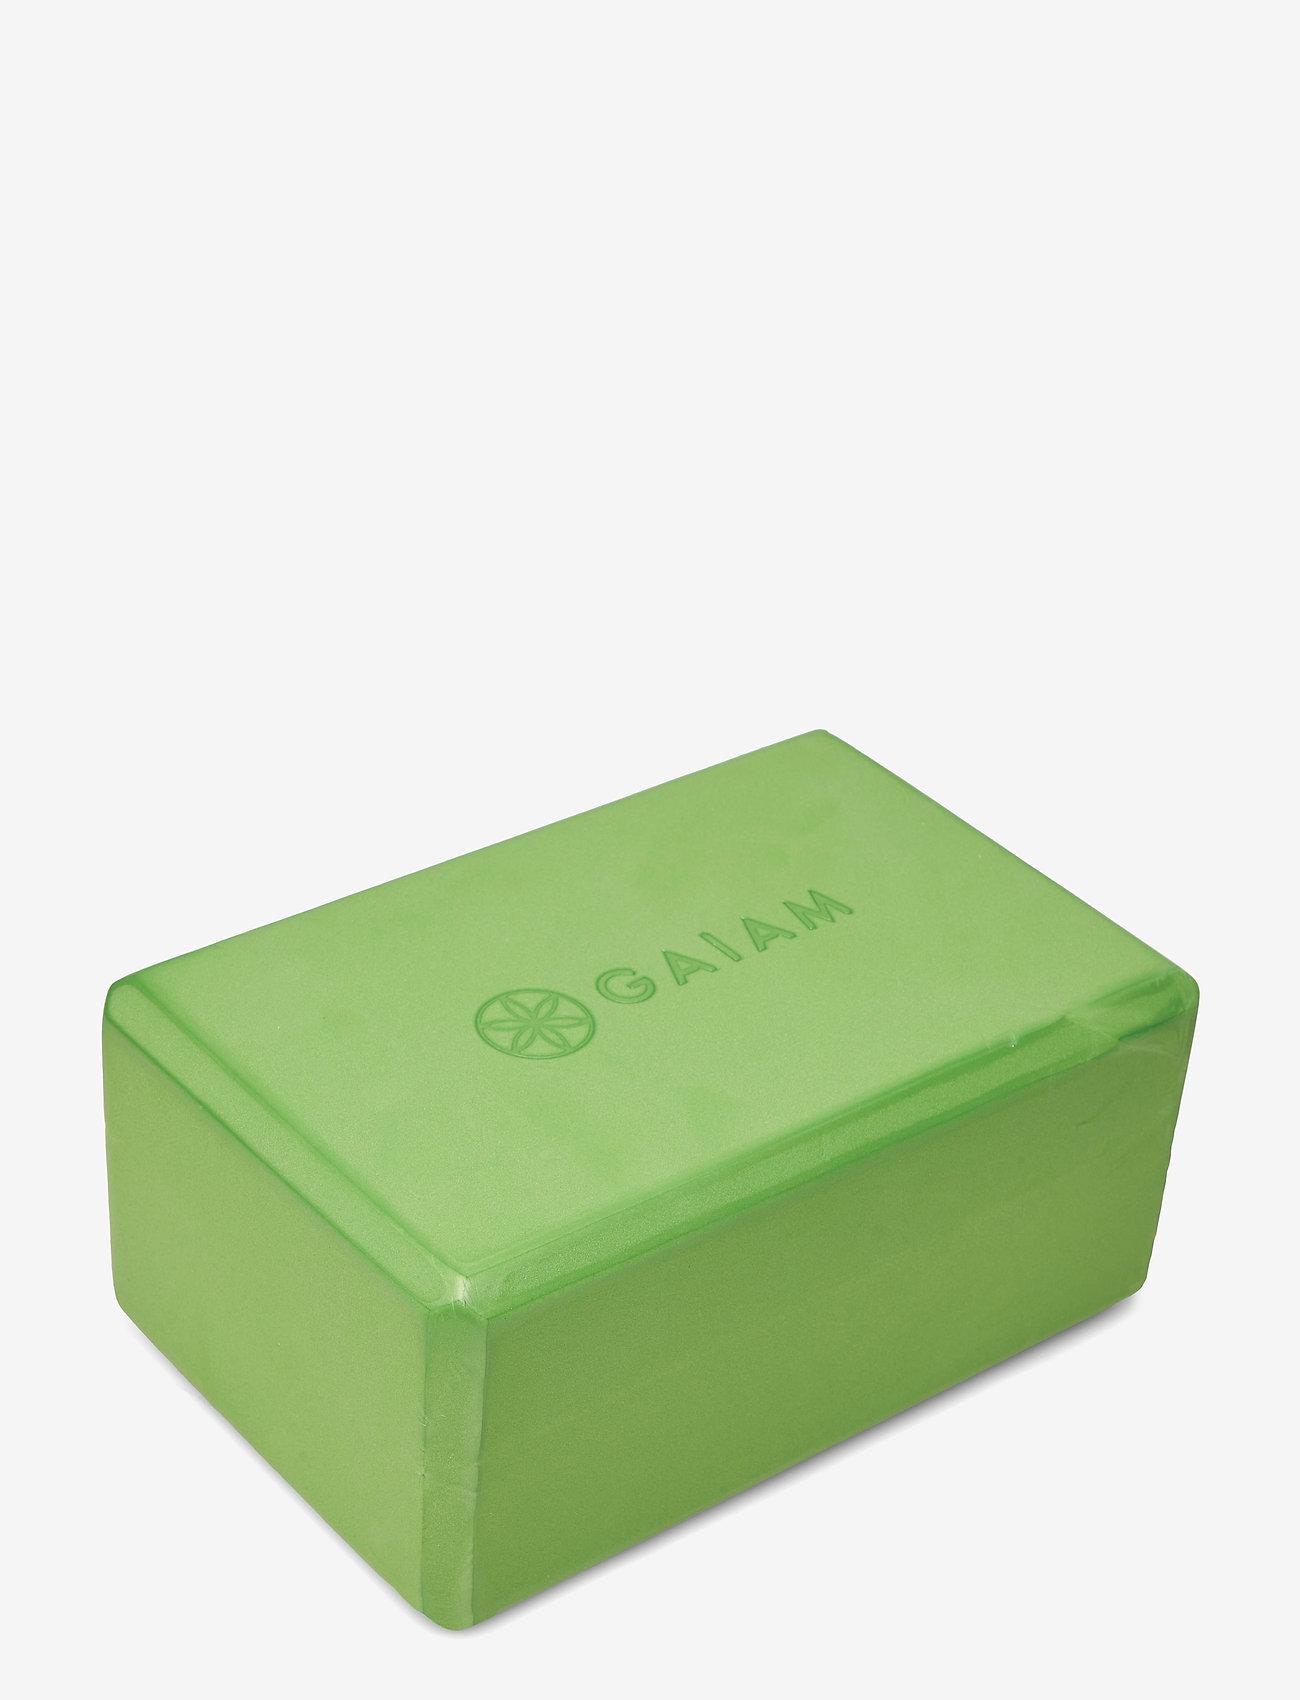 Gaiam - Yoga Block Green - yogamatten & uitrusting - green - 1